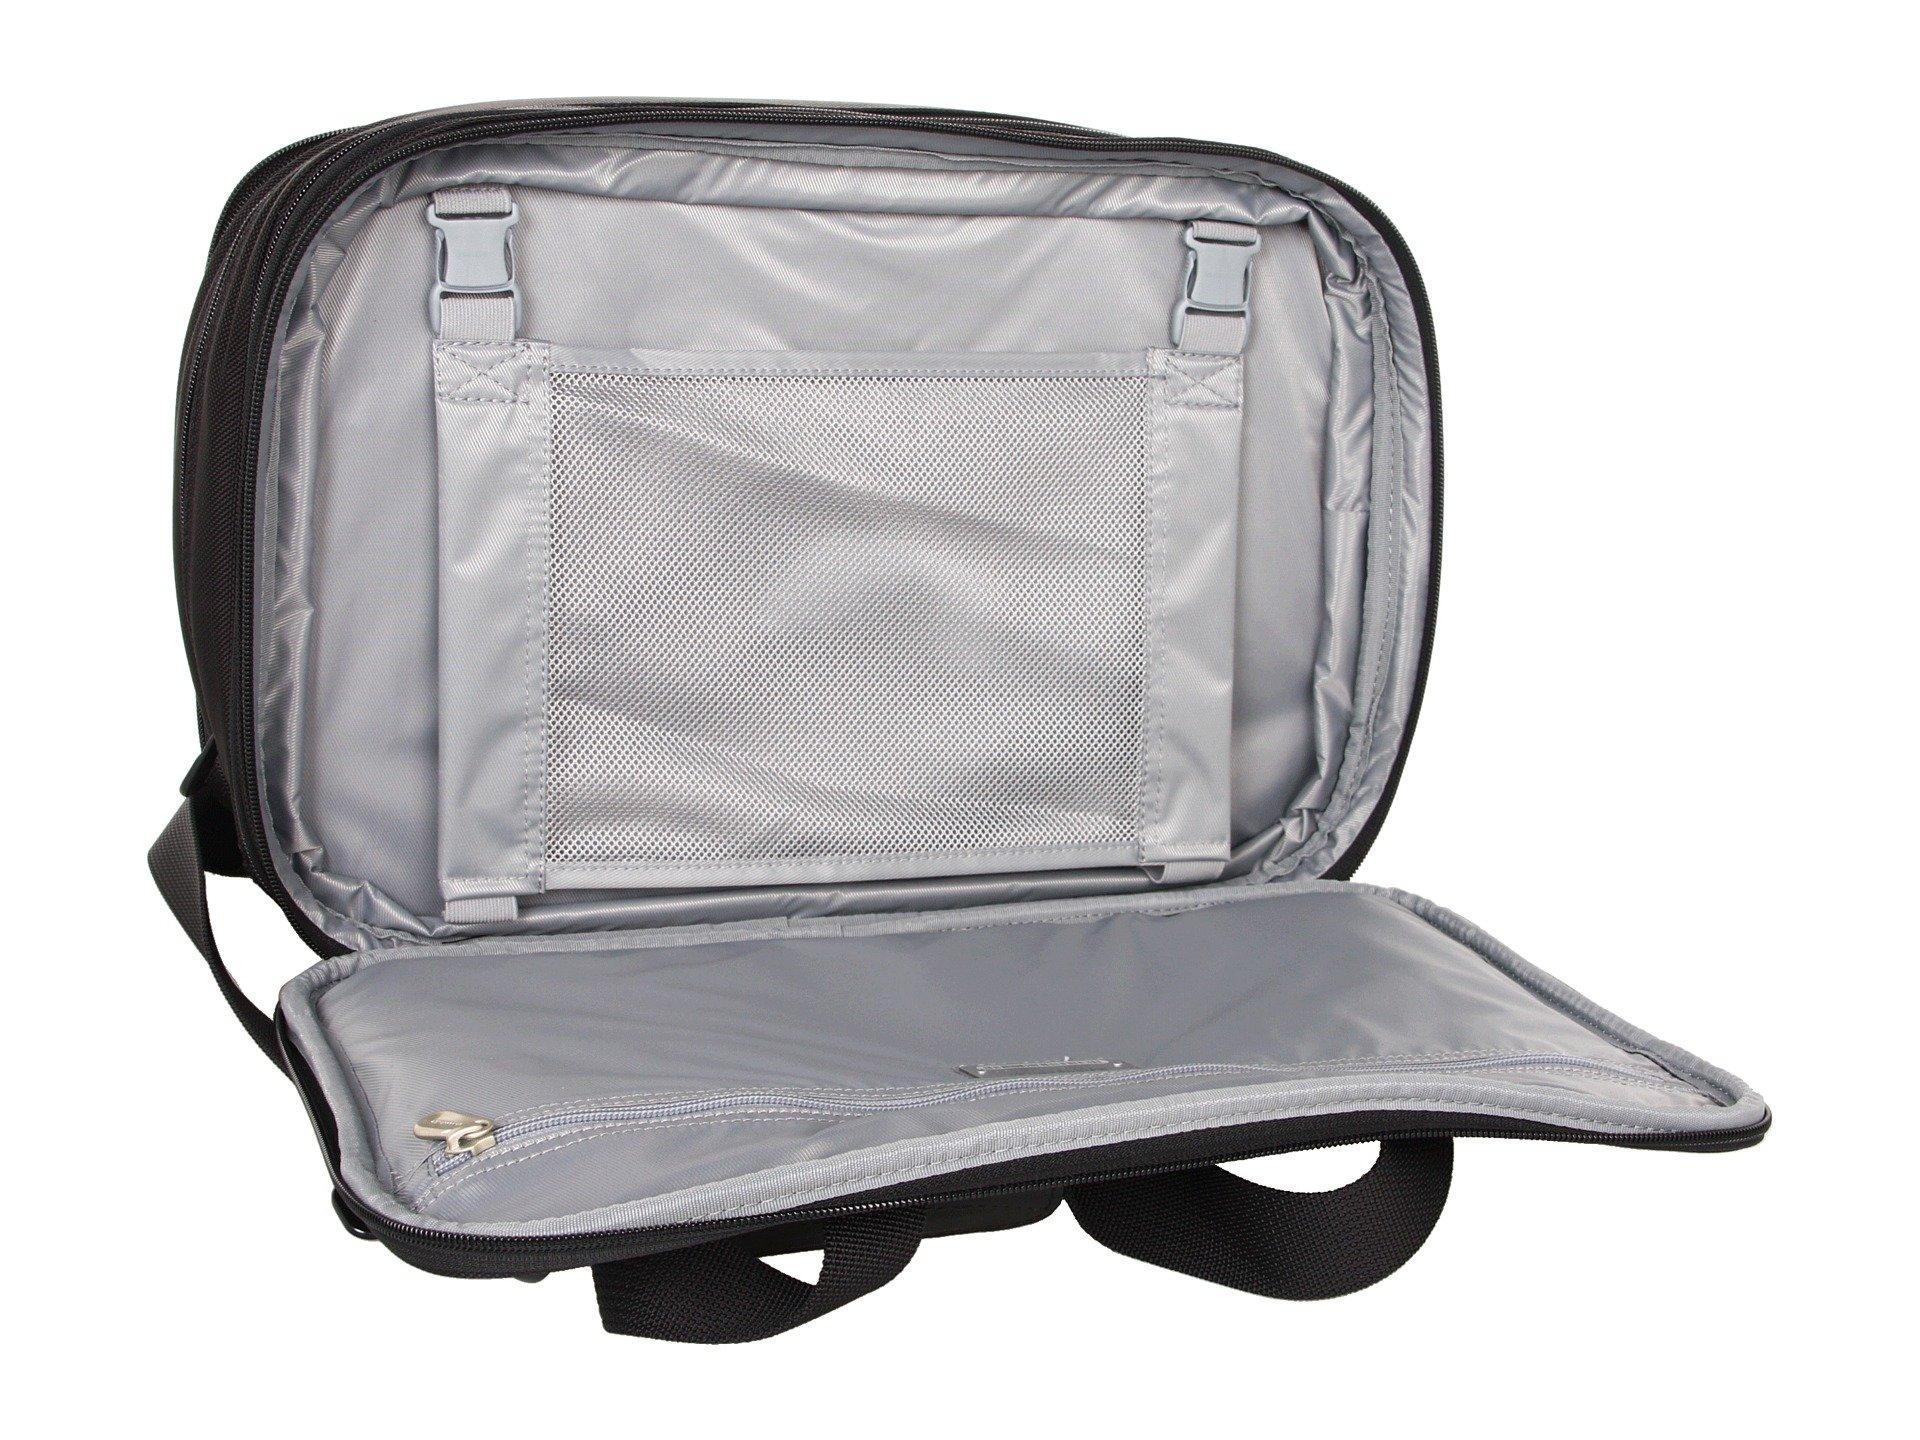 Cabin Briggs Bag Expandable Riley Baseline Black amp; 0XqwXrtI